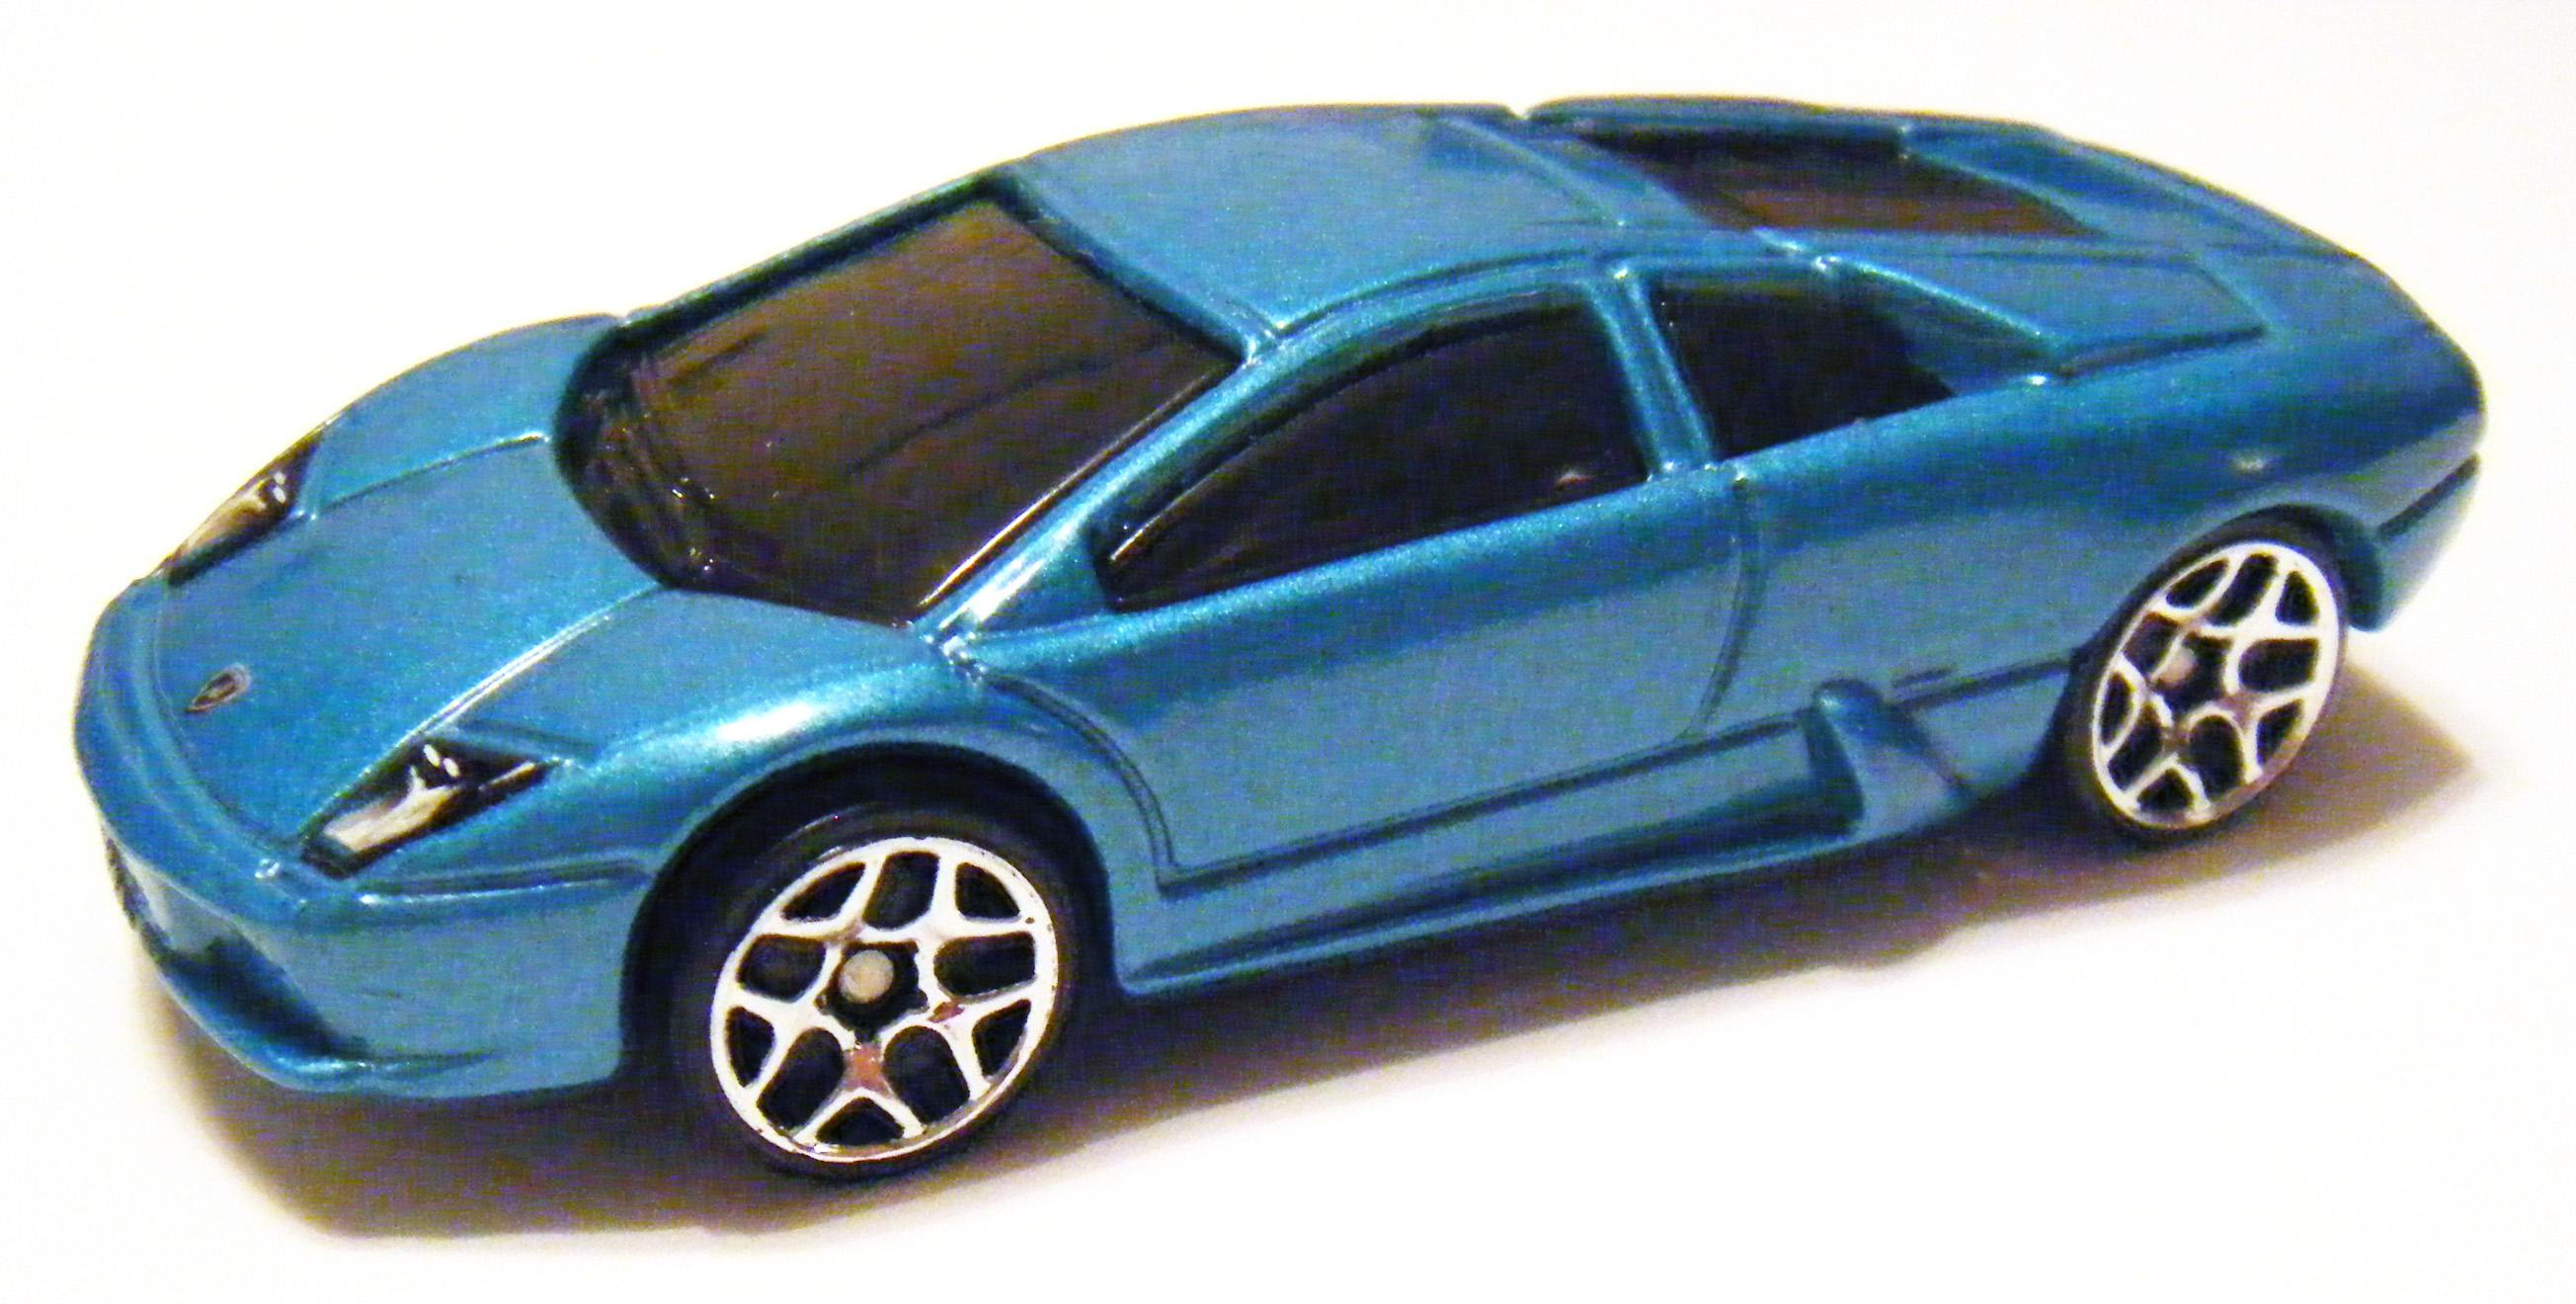 latest?cb=20110925030943 Surprising Lamborghini Gallardo Hot Wheels Wiki Cars Trend